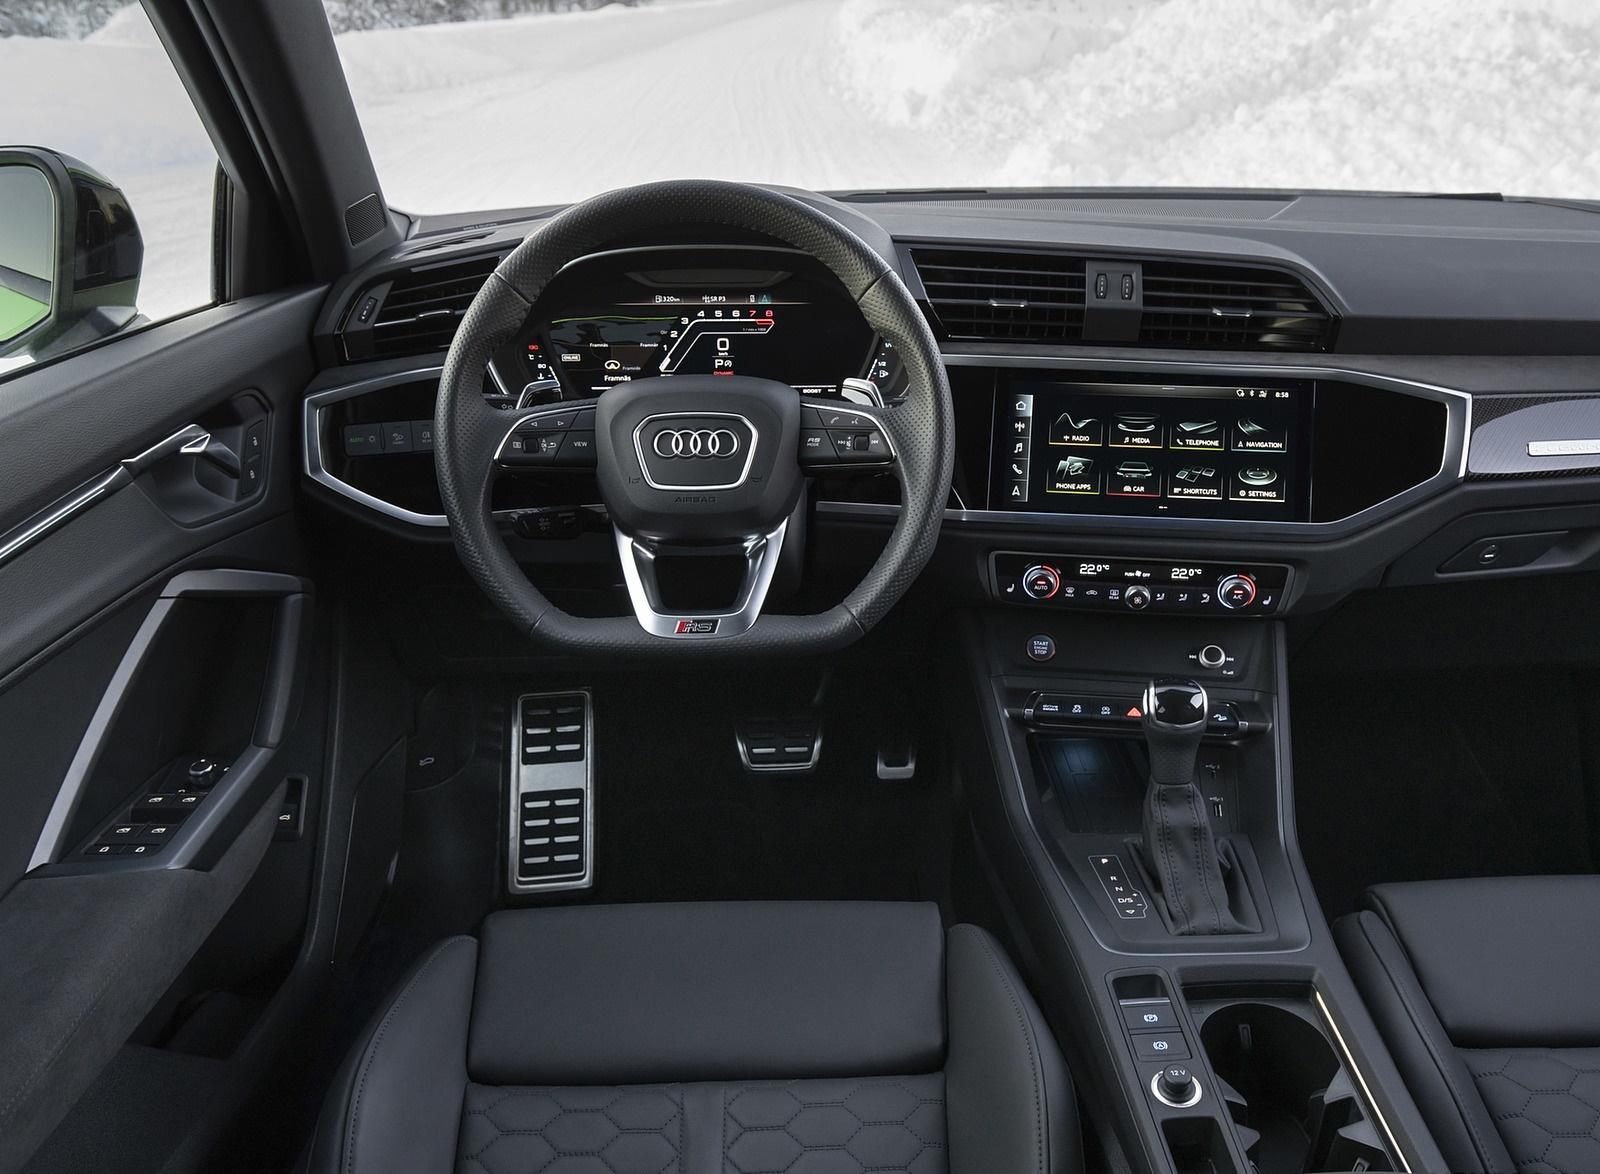 2020 Audi RS Q3 Interior Cockpit Wallpapers #40 of 116